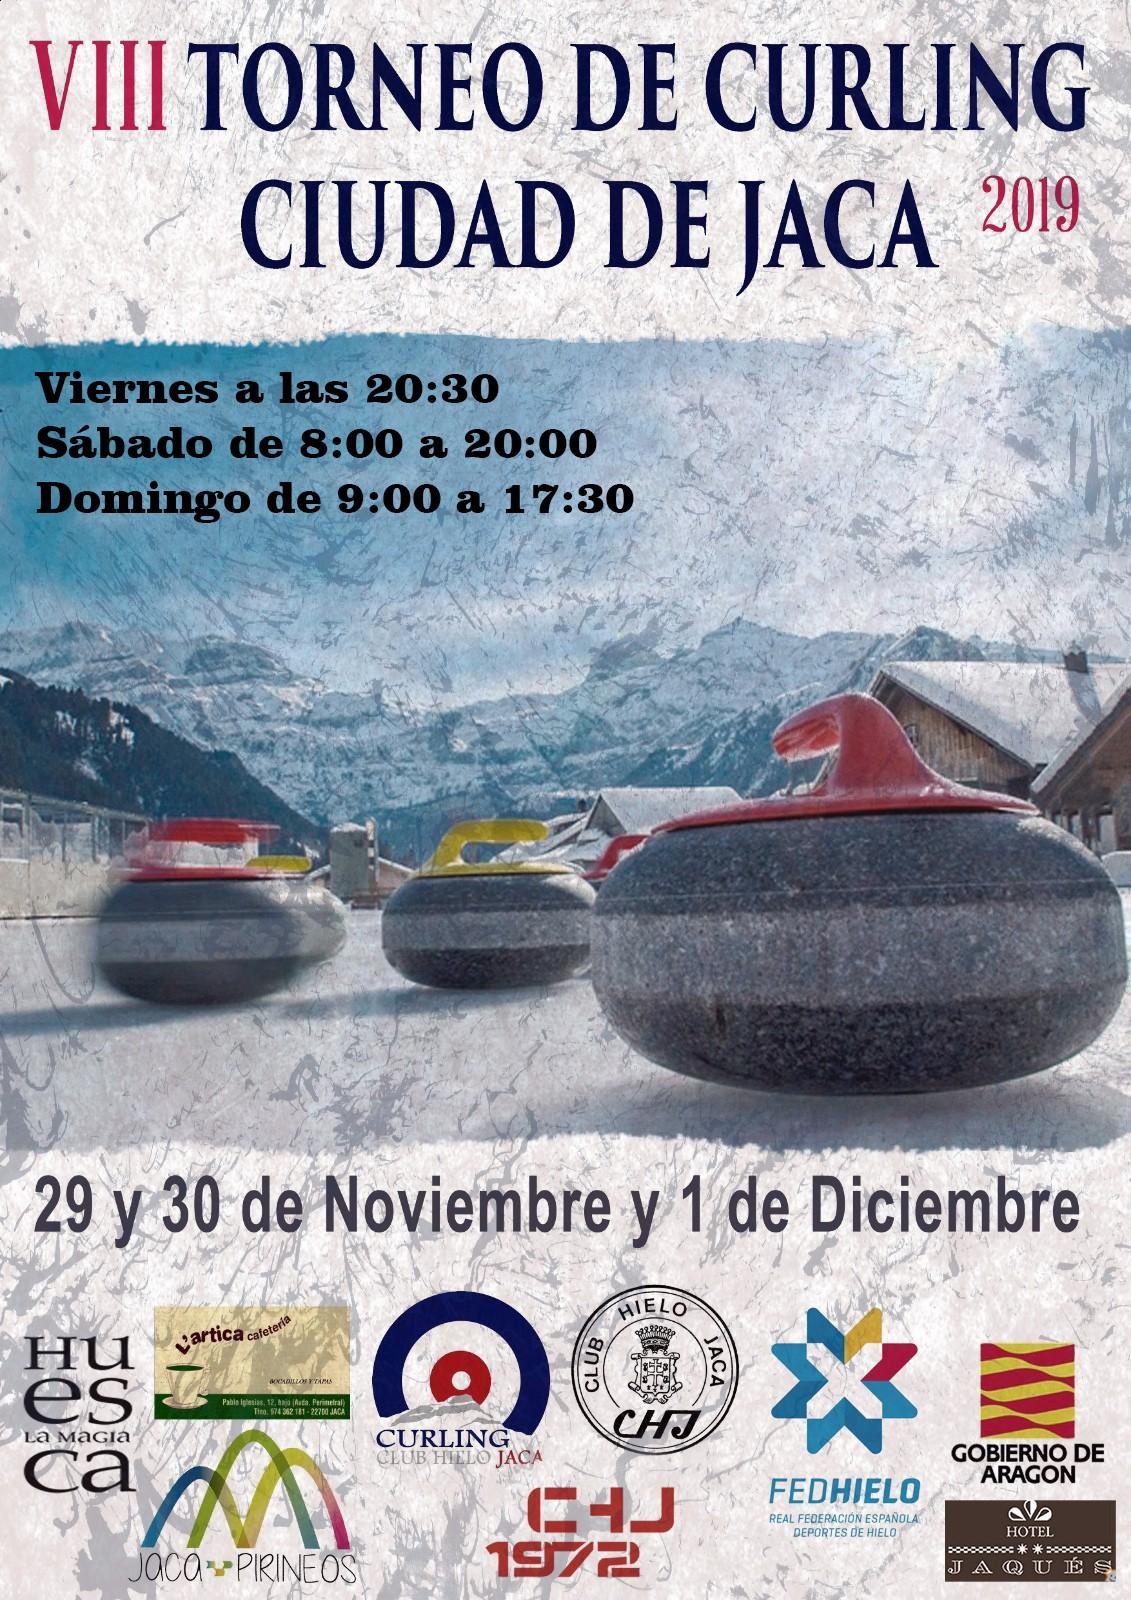 Curling en Jaca